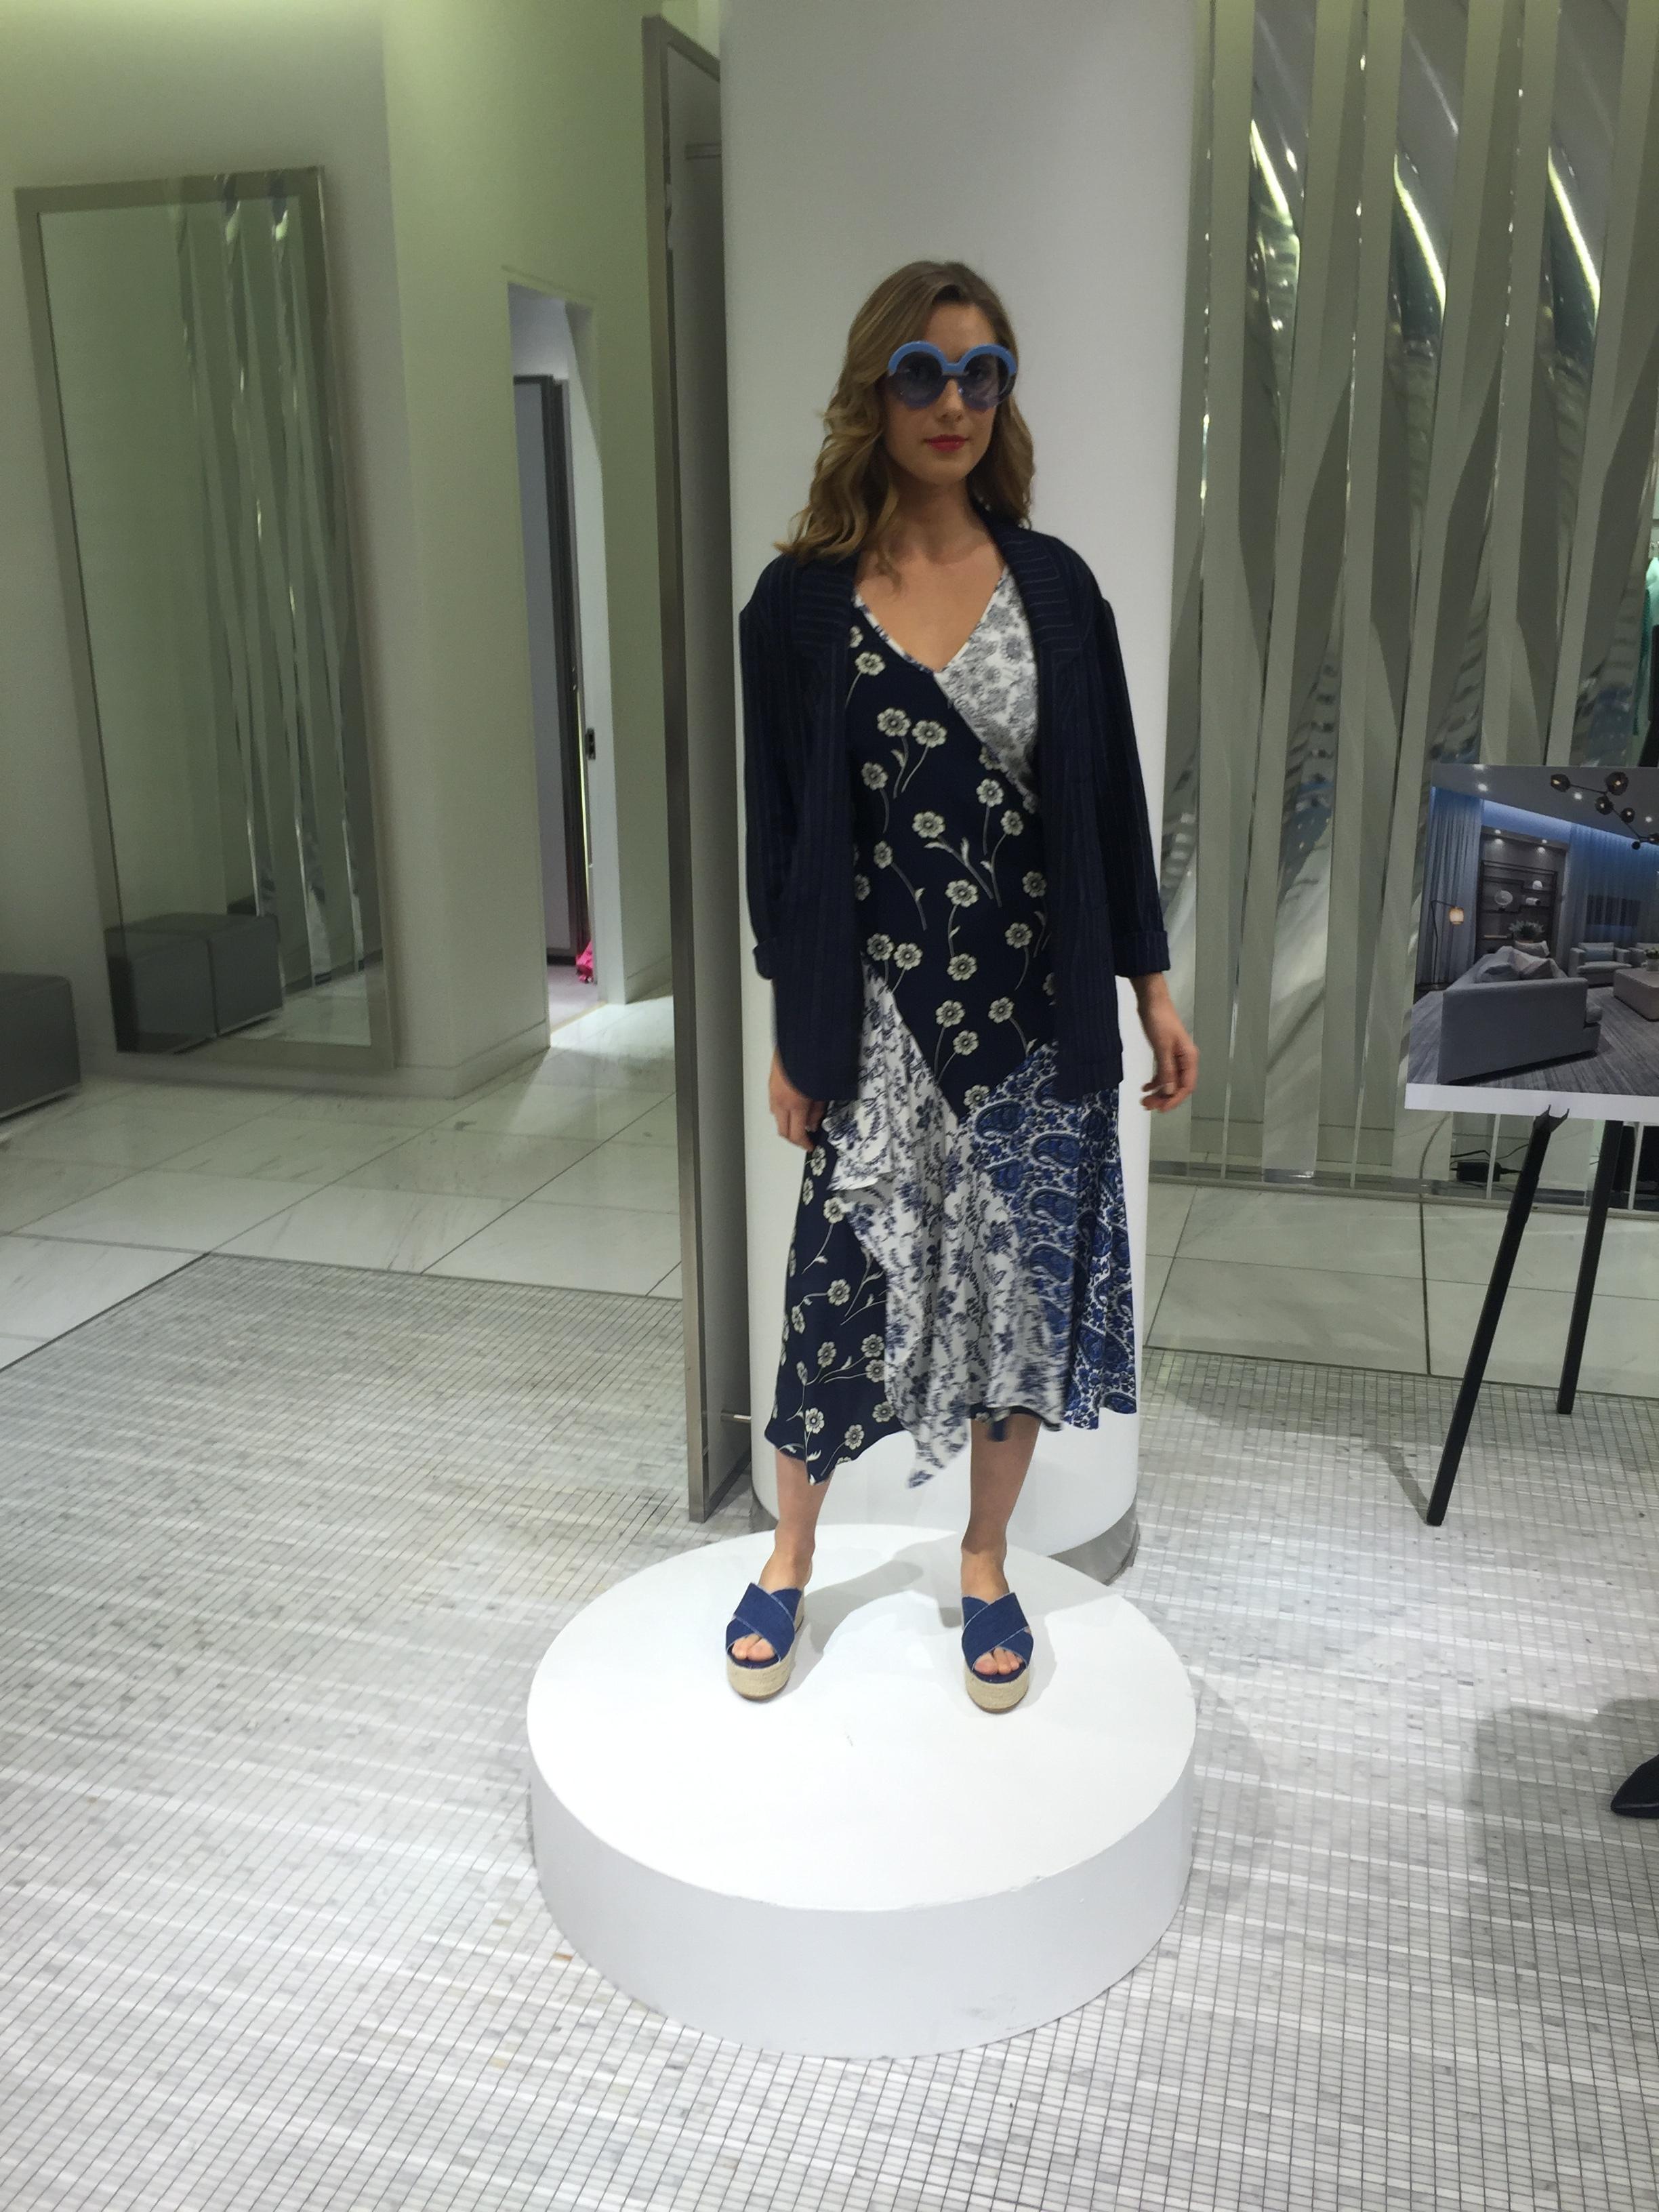 dress, DEREK LAM. jacket, SMYTHE. shoes, PRADA. sunnies, KAREN WALKER